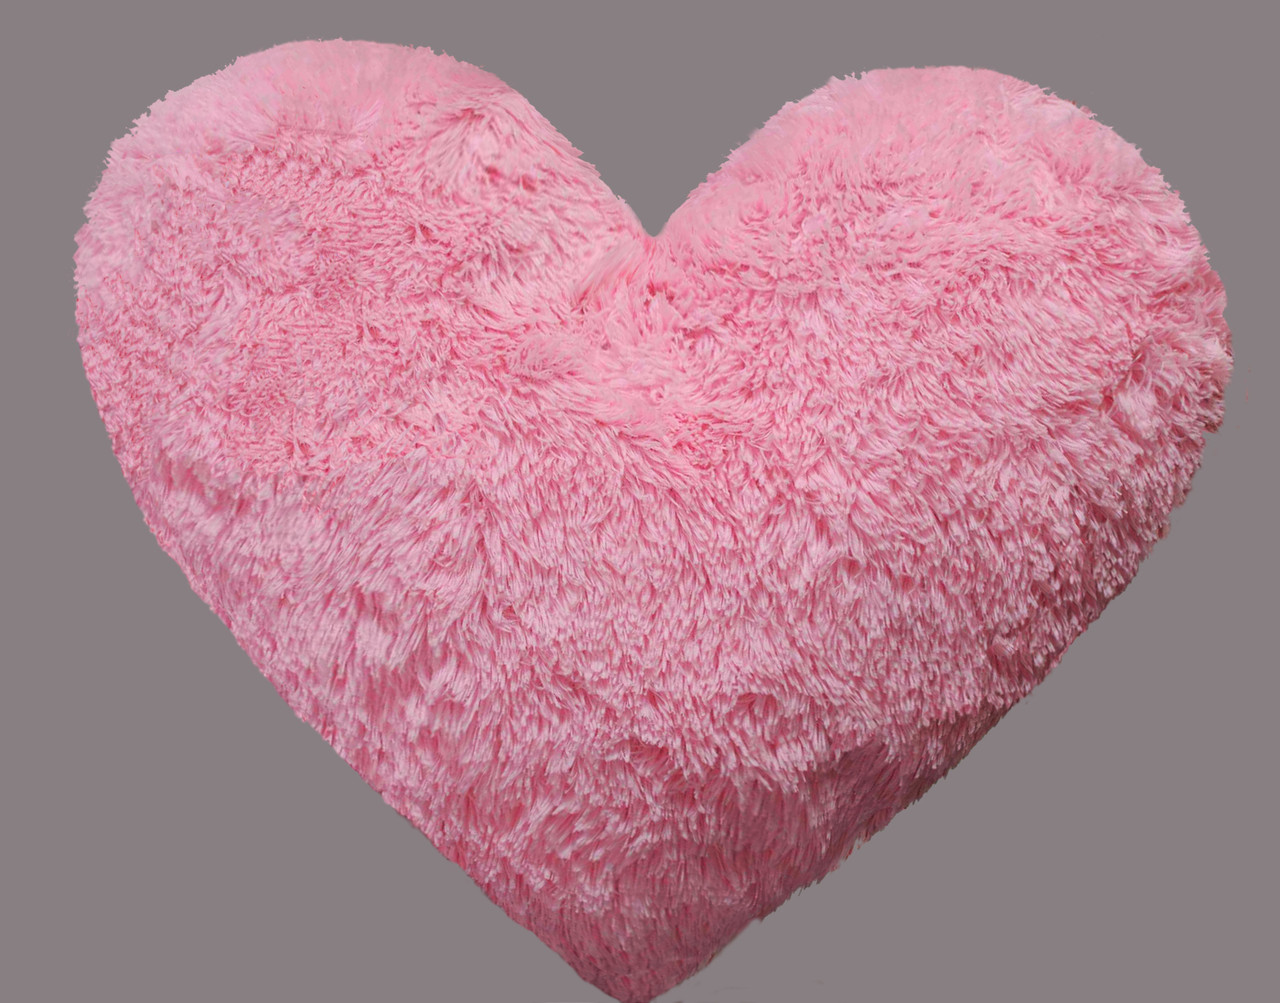 Сердце-подушка розовое (Плюшевое) 30 см